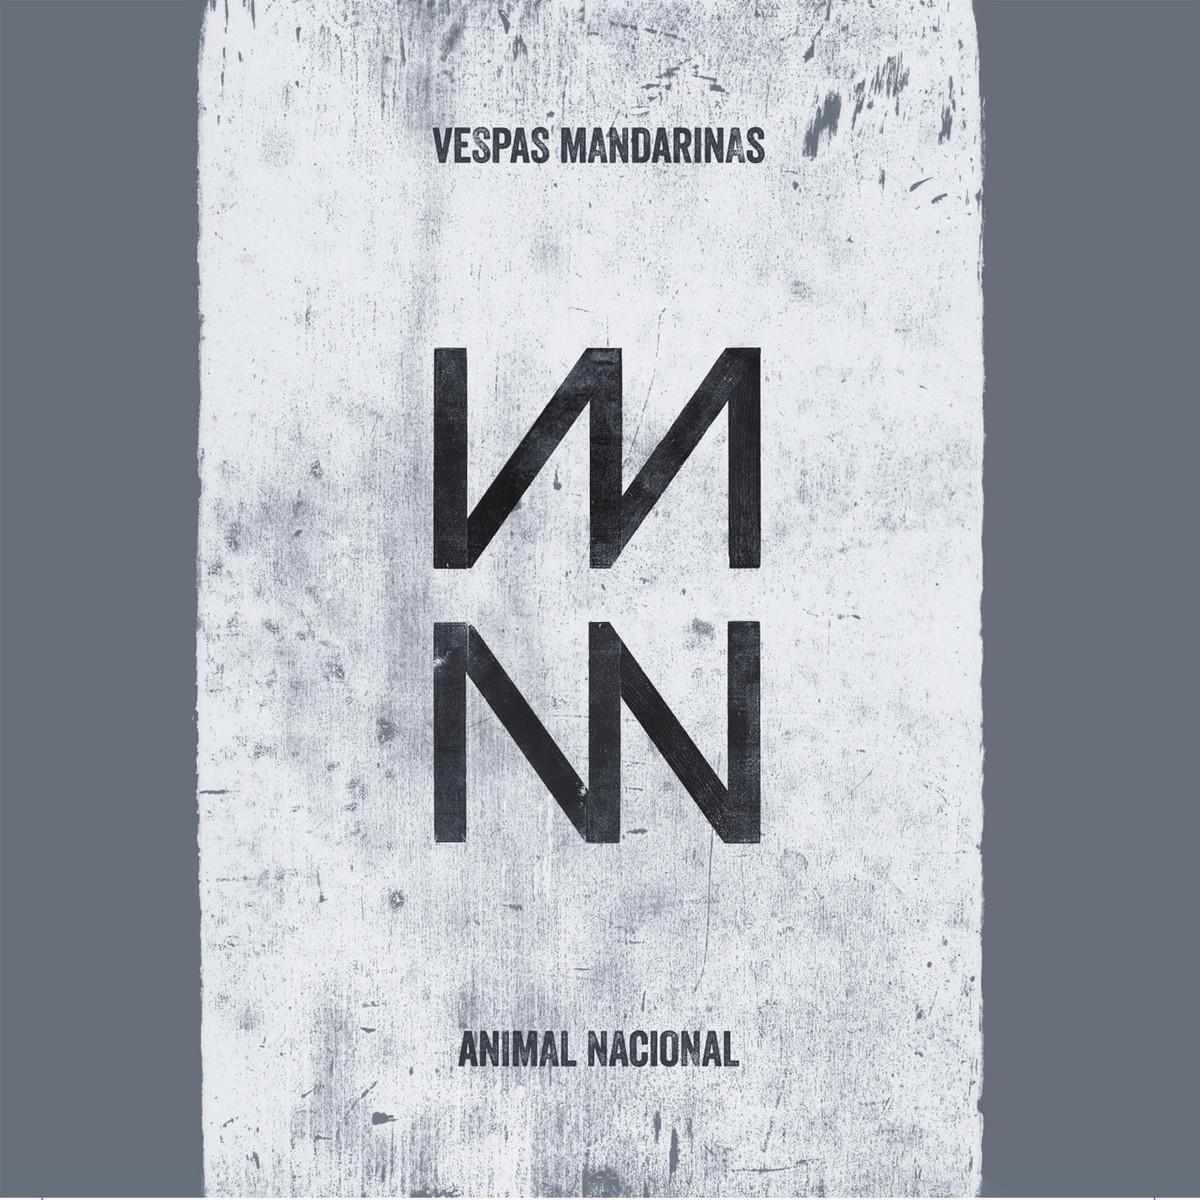 Álbum Animal Nacional, da banda Vespas Mandarinas